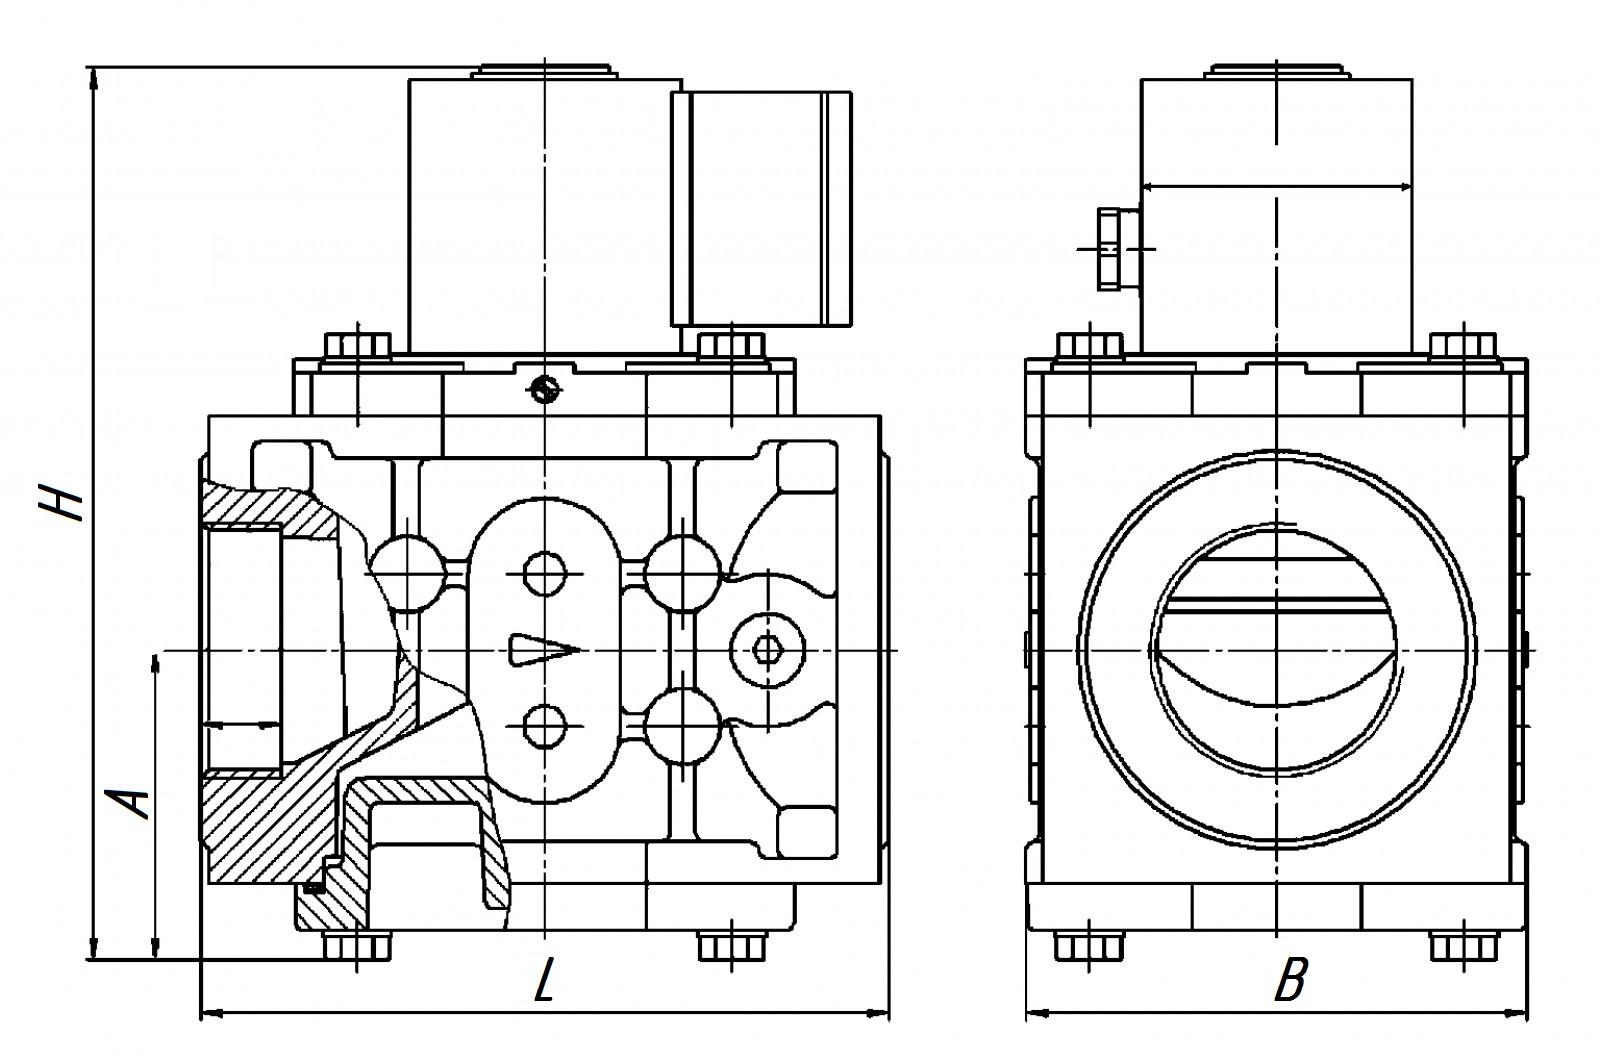 СГ - ЭКВз - Р - 0,75 - 25/1,6 (1:30) слева RABO